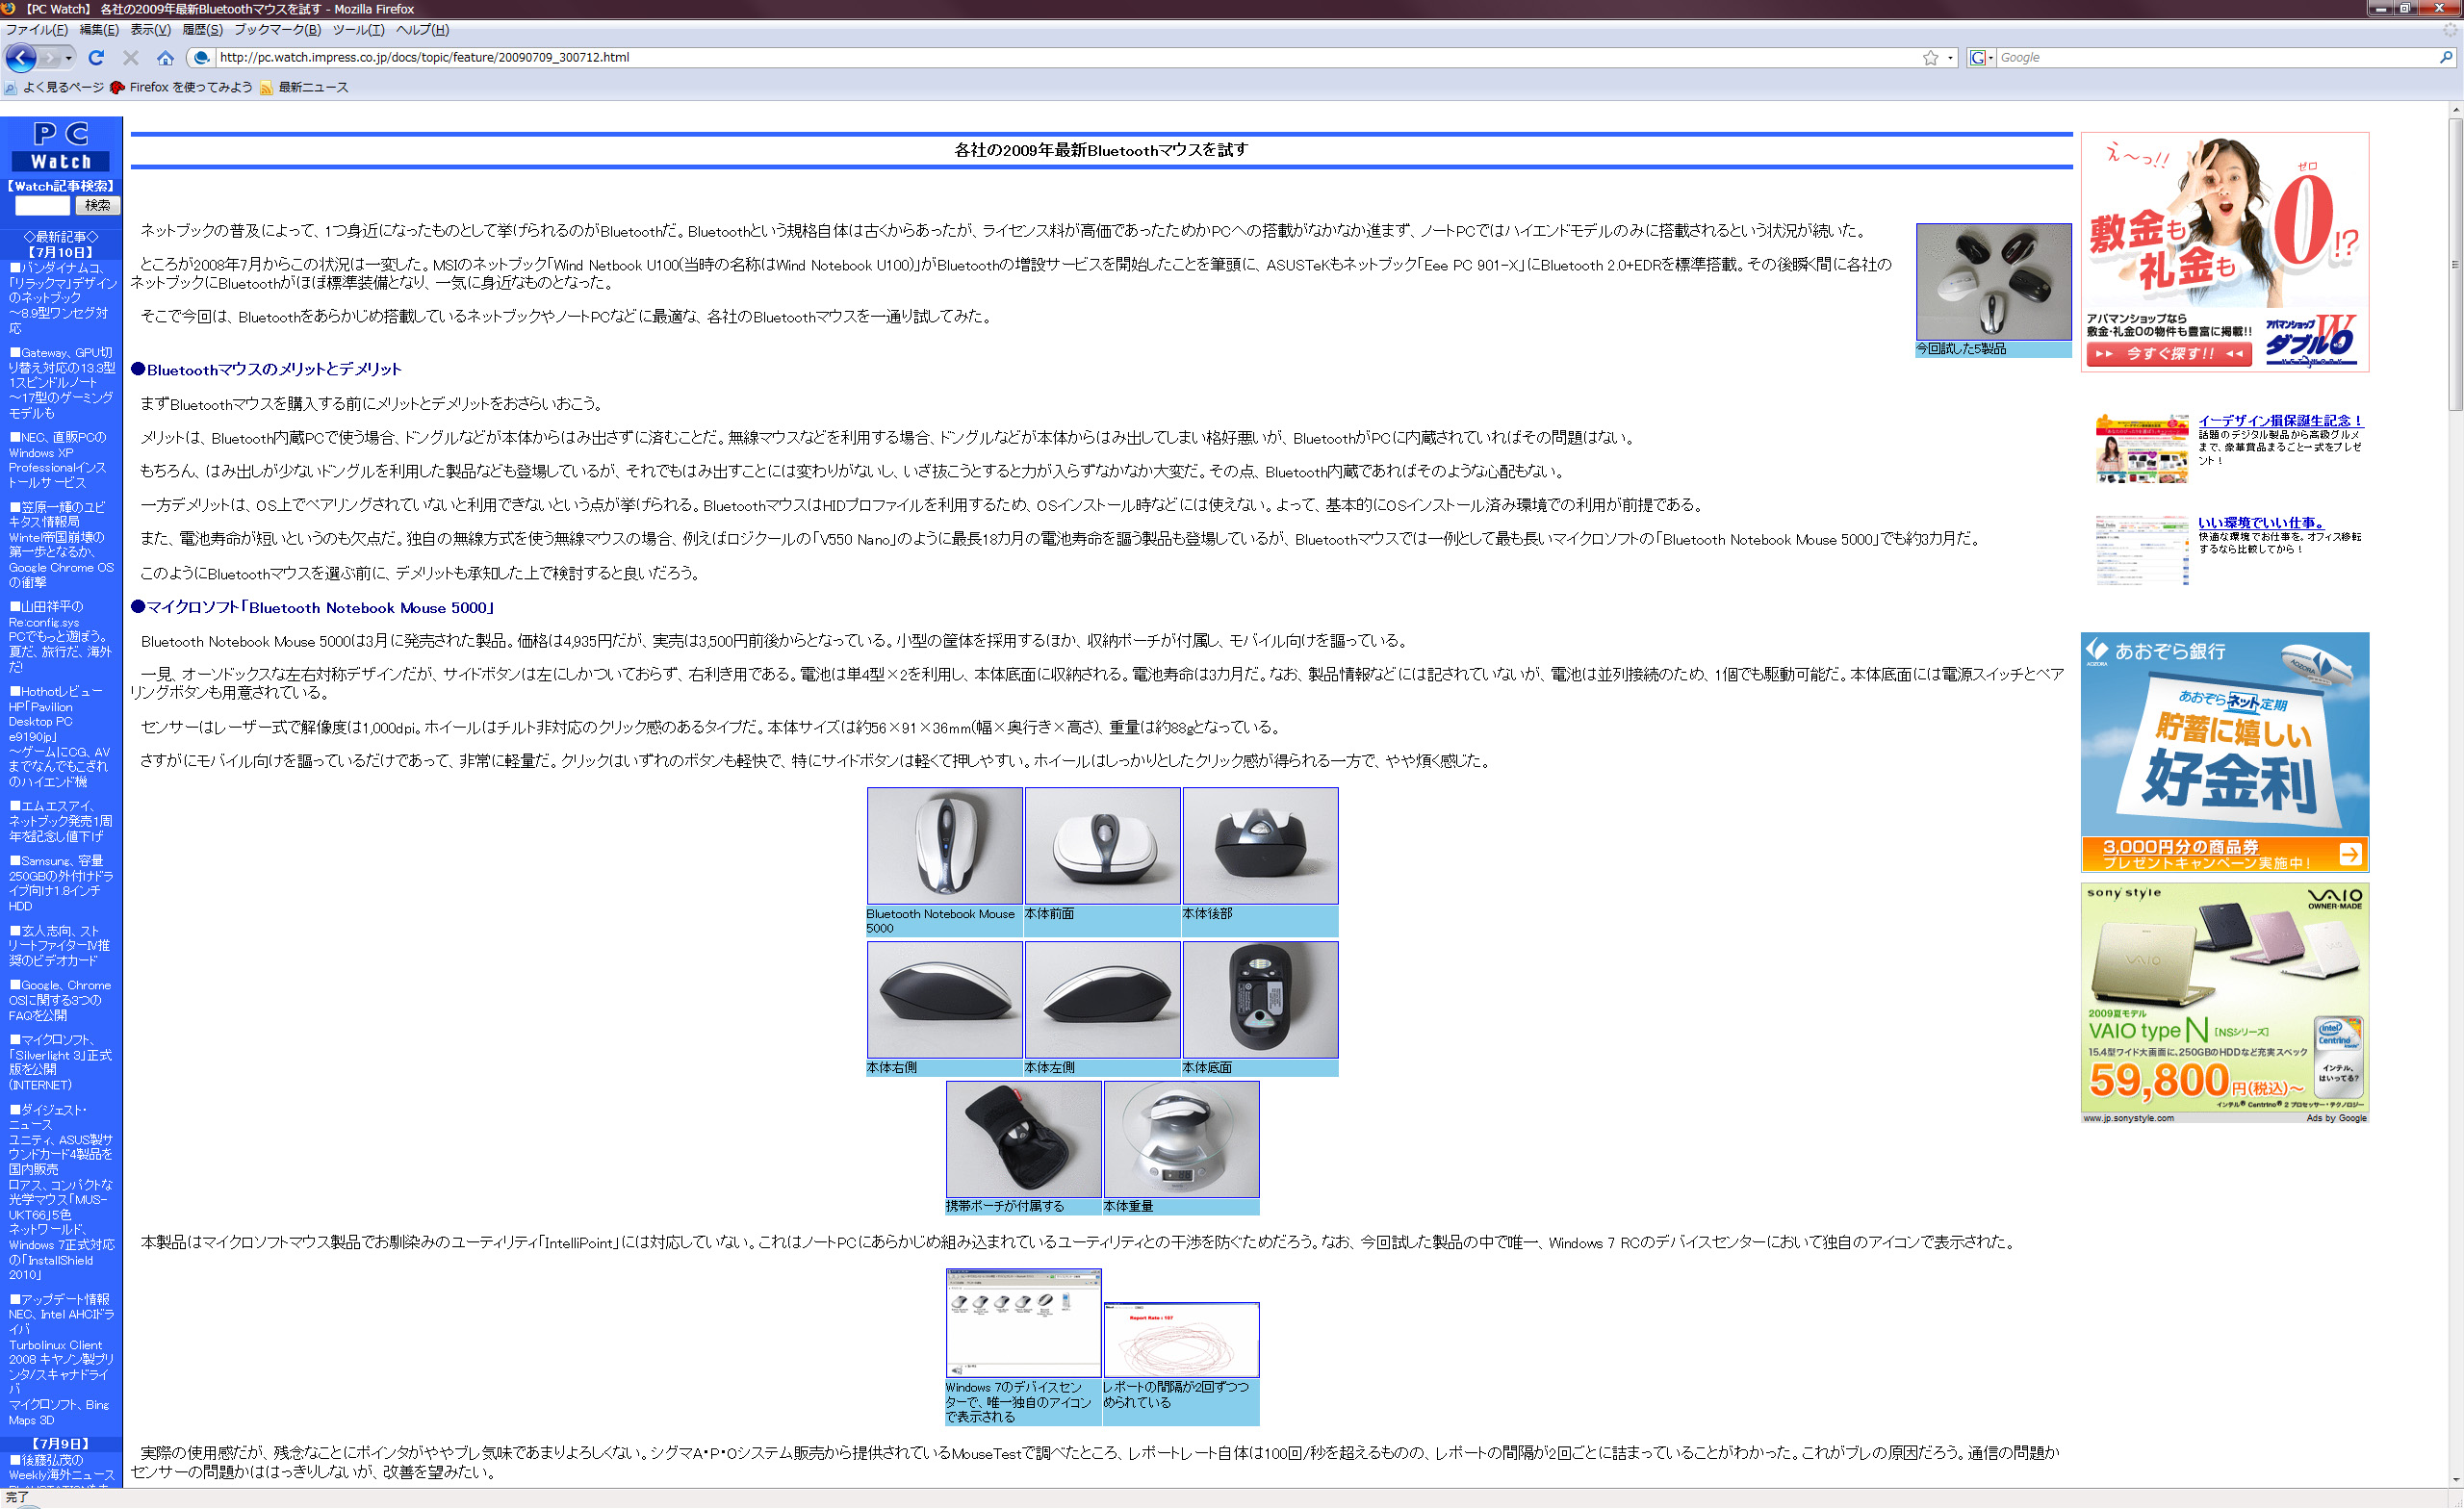 Webブラウザを最大化してPC Watchの記事を表示させたところ。大抵の段落が1行で表示される